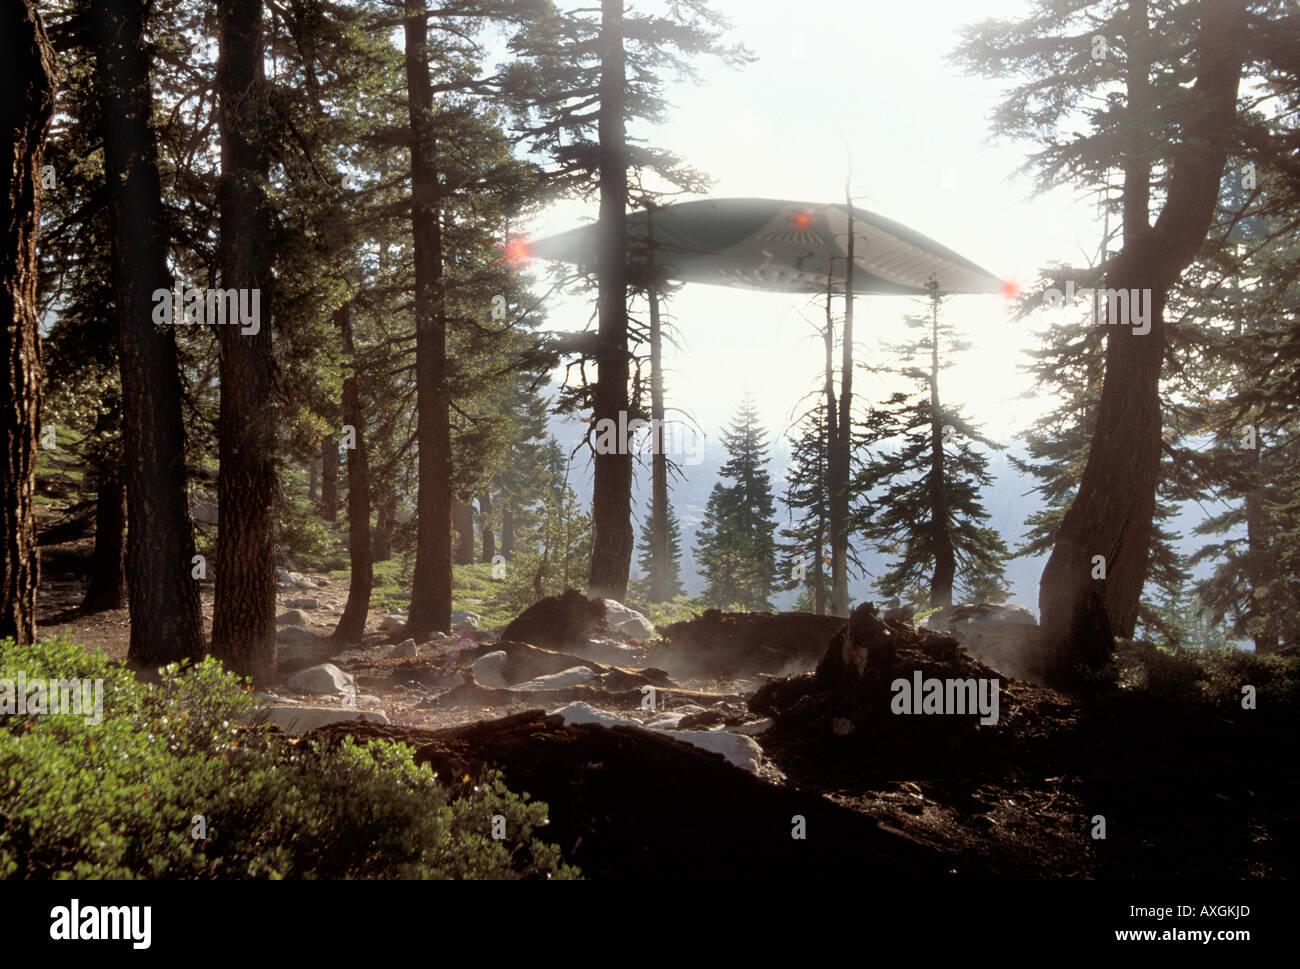 UFO sighting - Stock Image